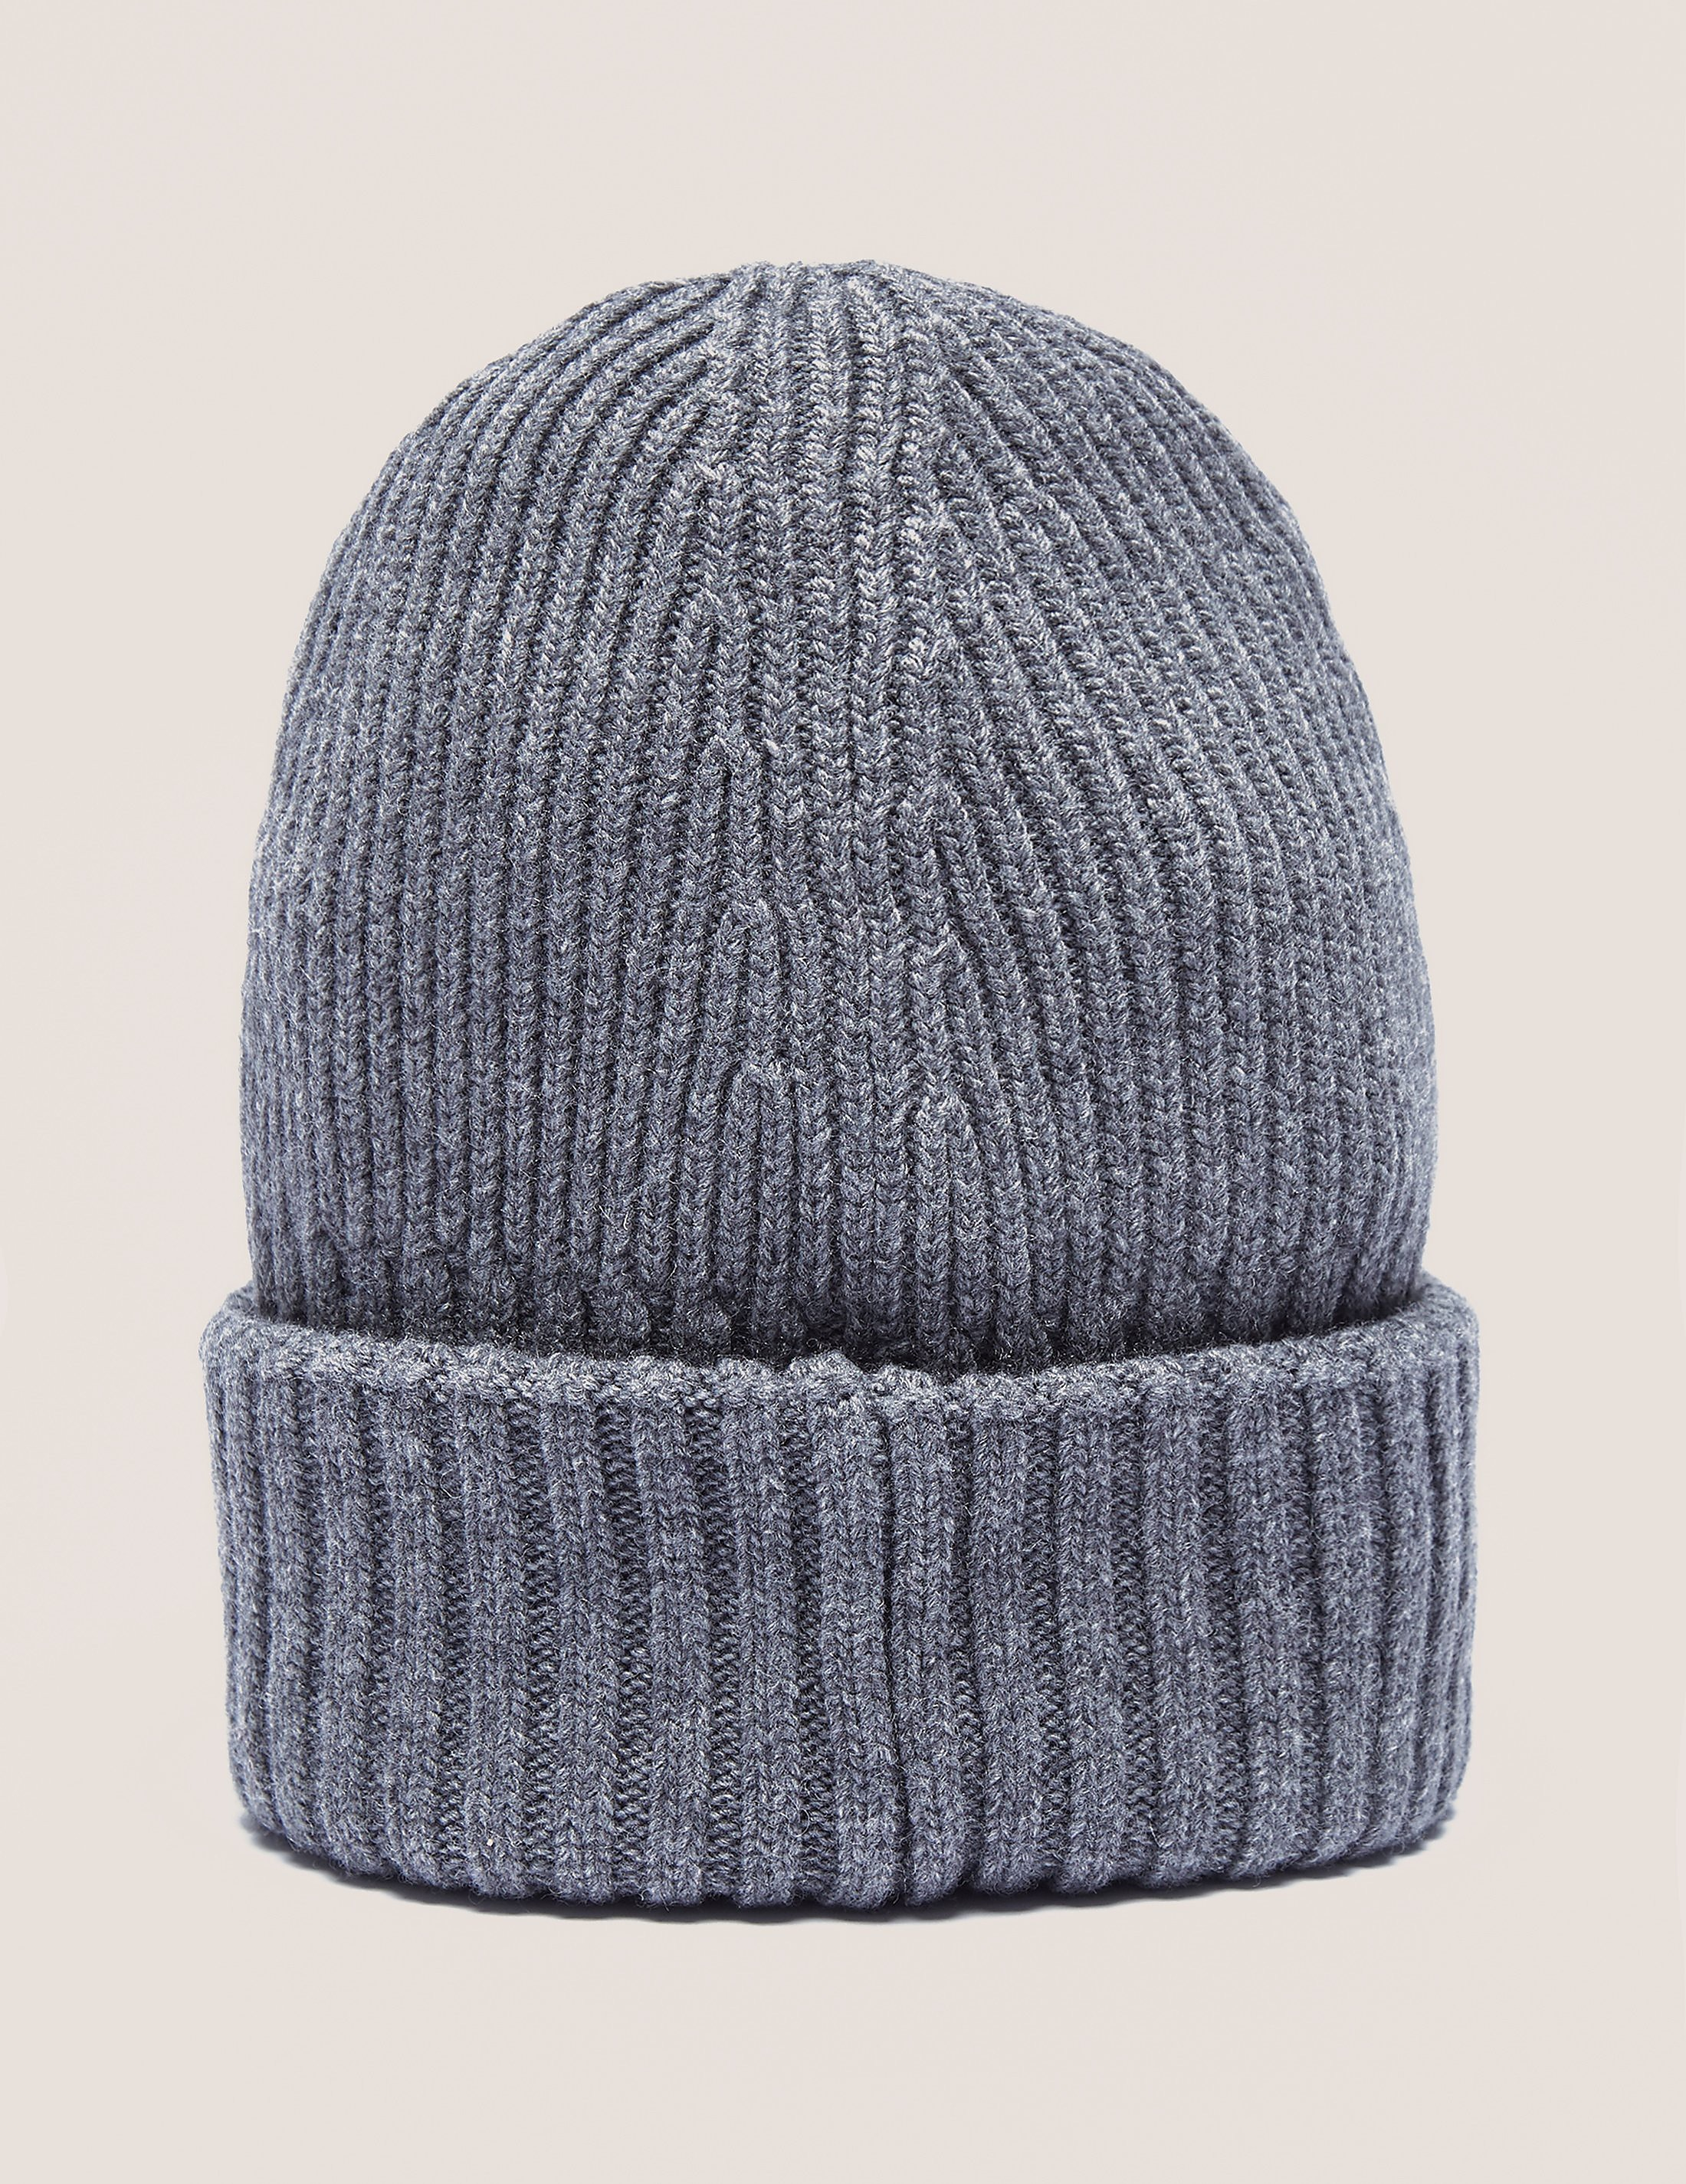 Stone Island SIK CAP